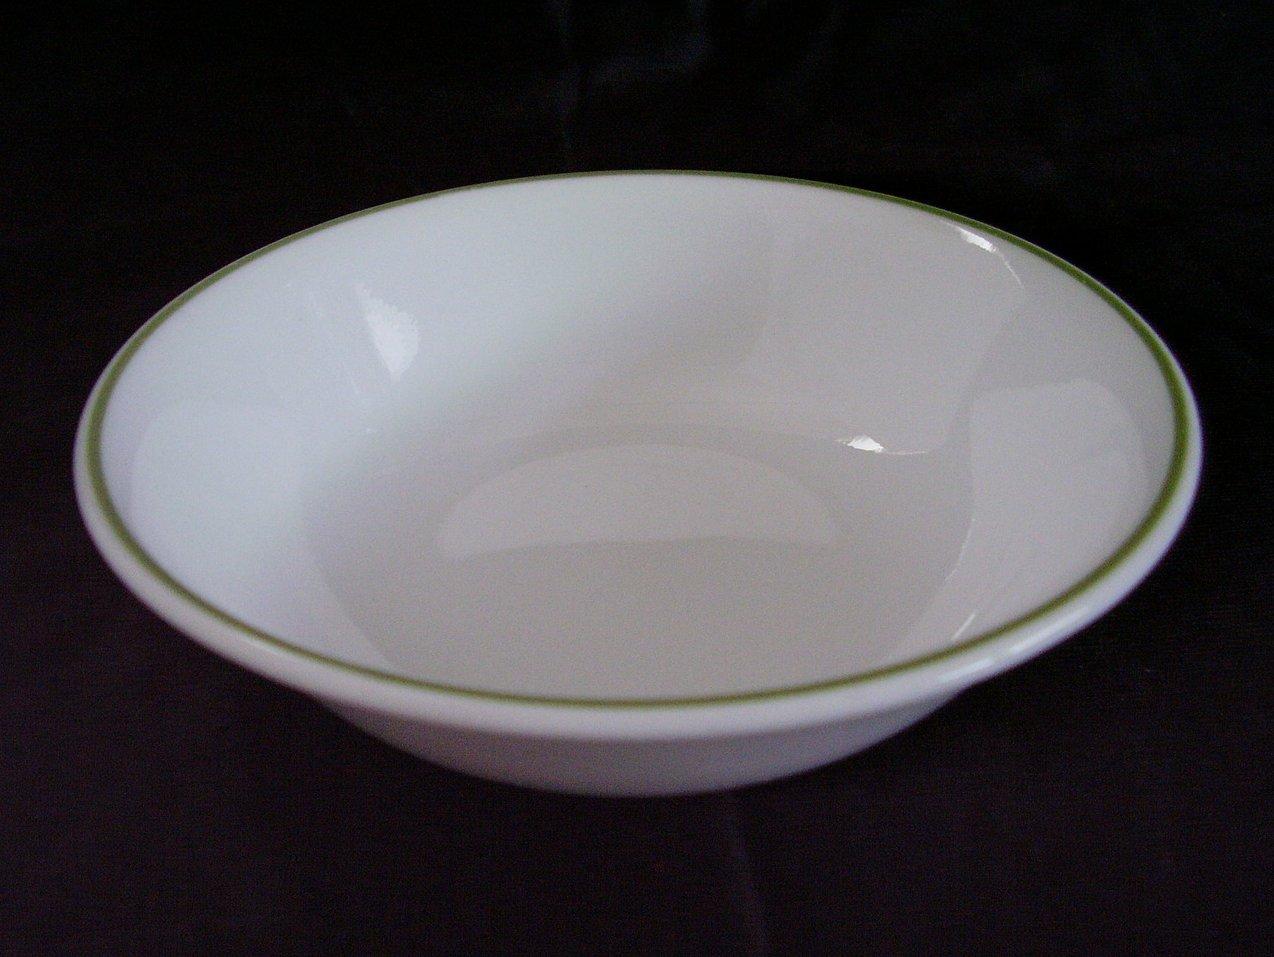 Corelle White Green Band Fruit Bowl